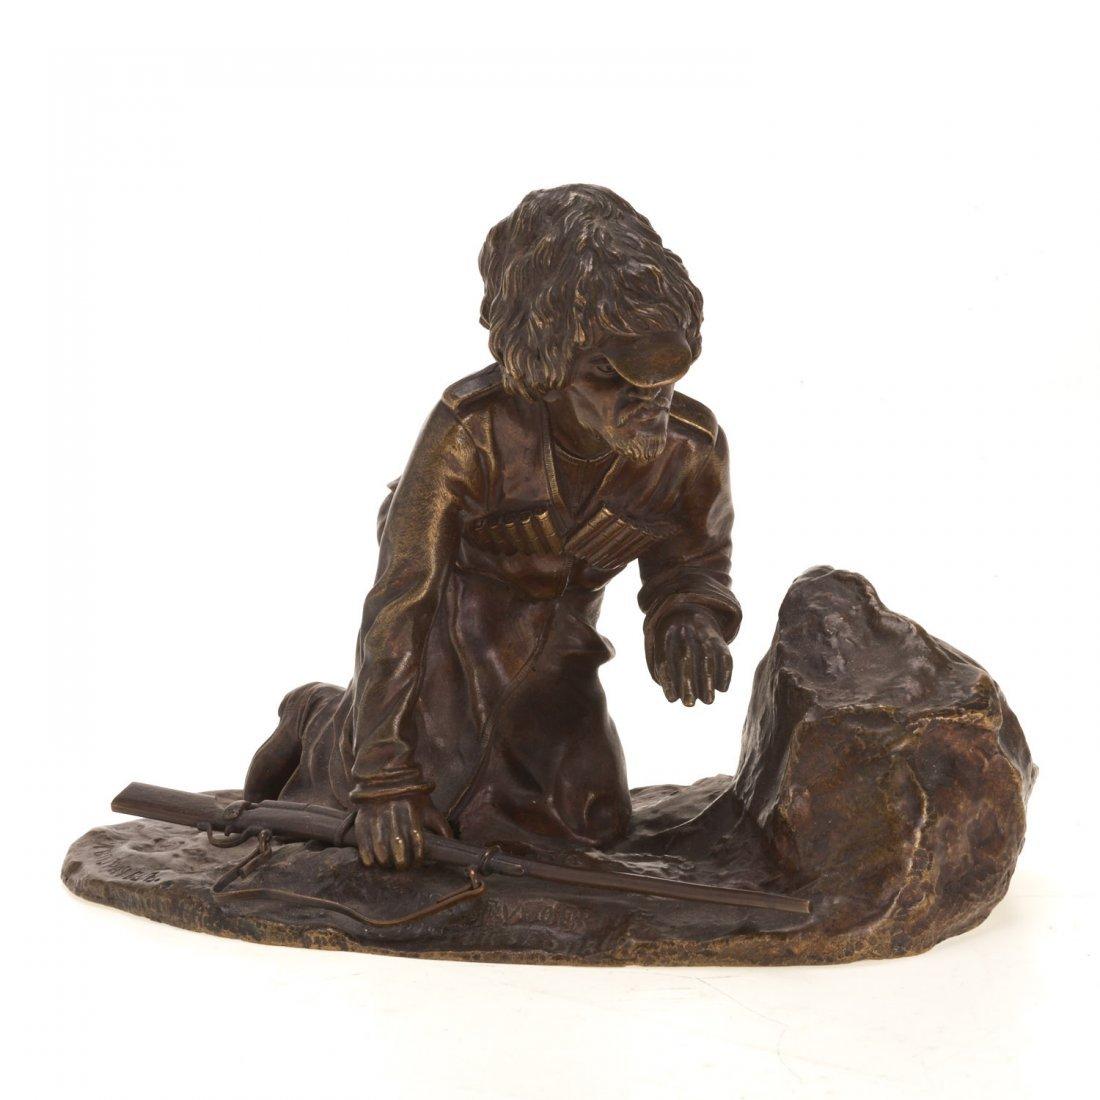 Russian bronze model of a Cossack soldier